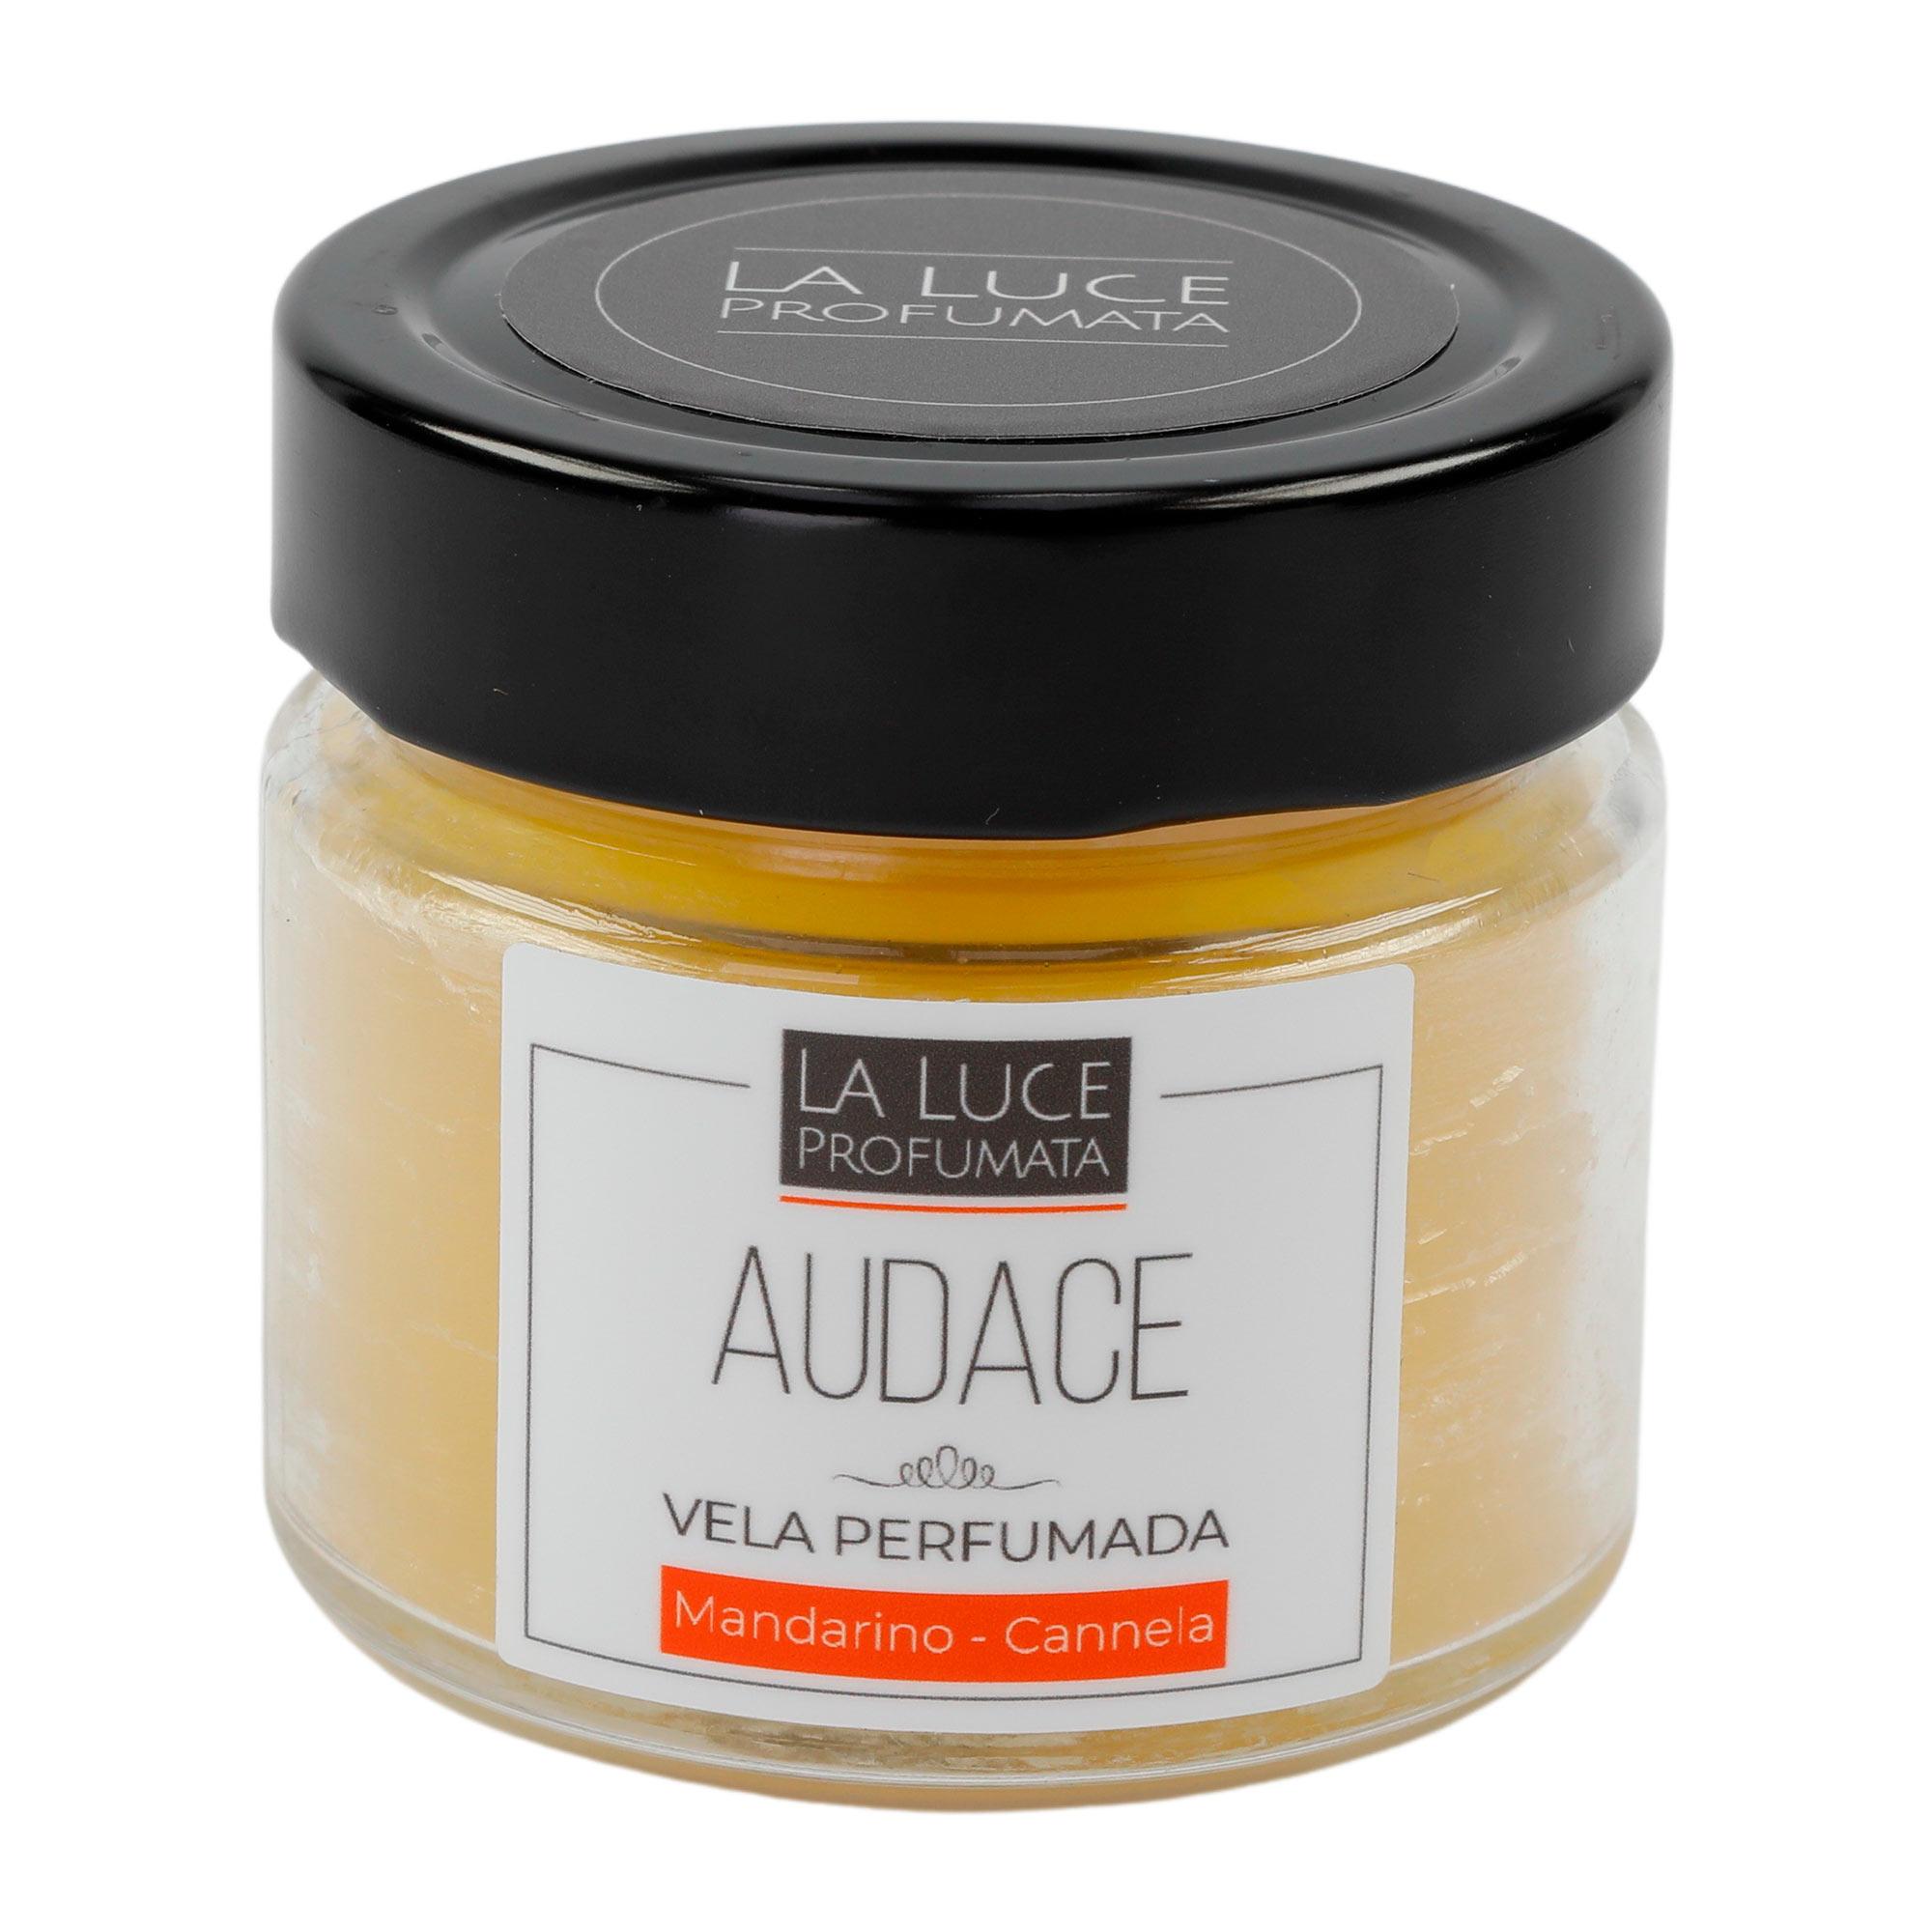 Vela Perfumada  (canela  e tangerina) 130 g